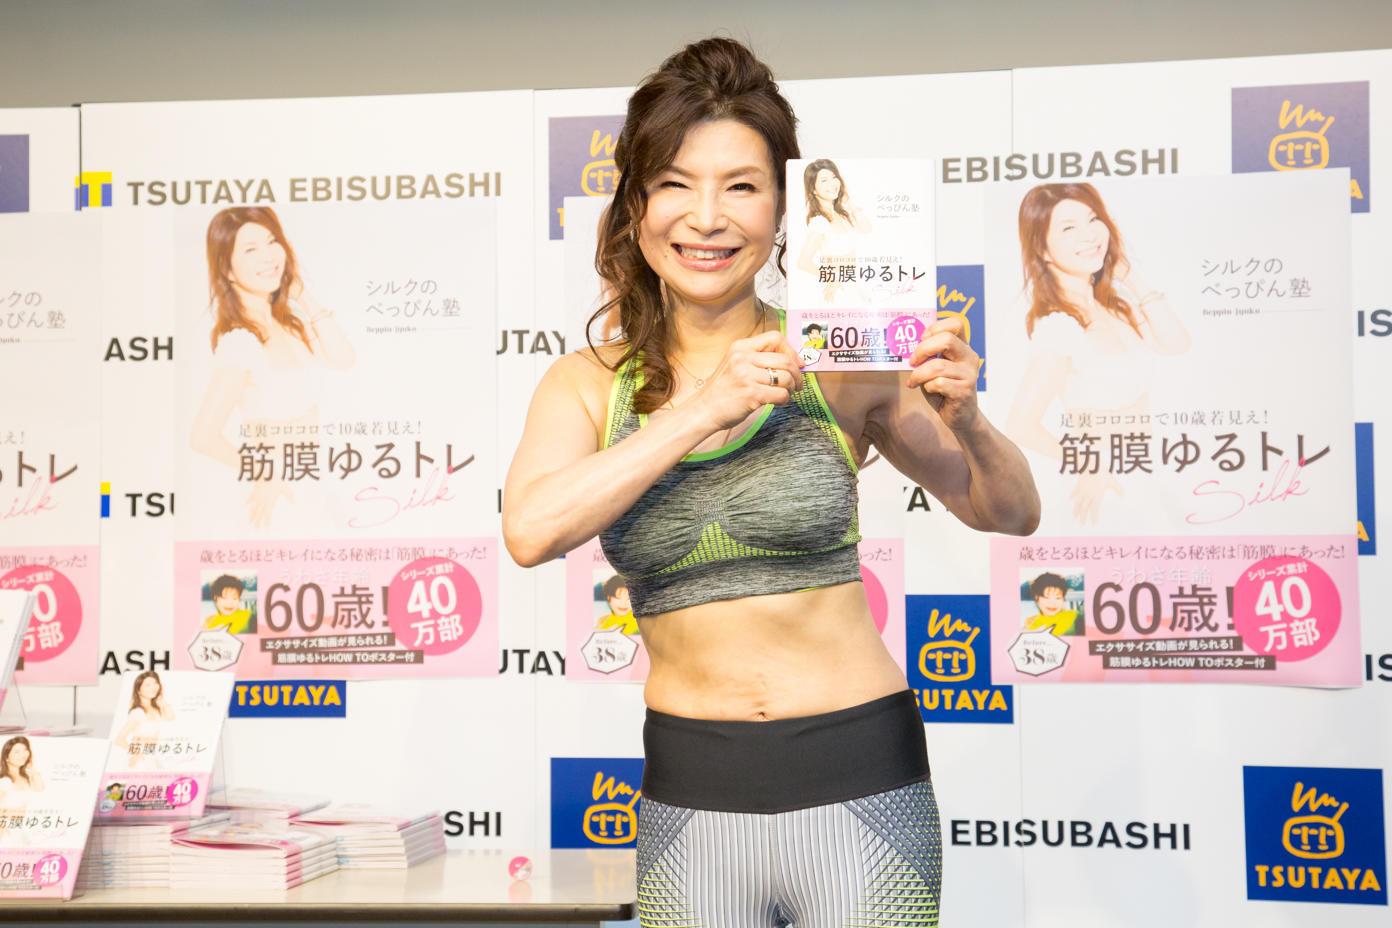 http://news.yoshimoto.co.jp/20180214234747-f56df303a970636a475127cf4ce362deacab0240.jpg